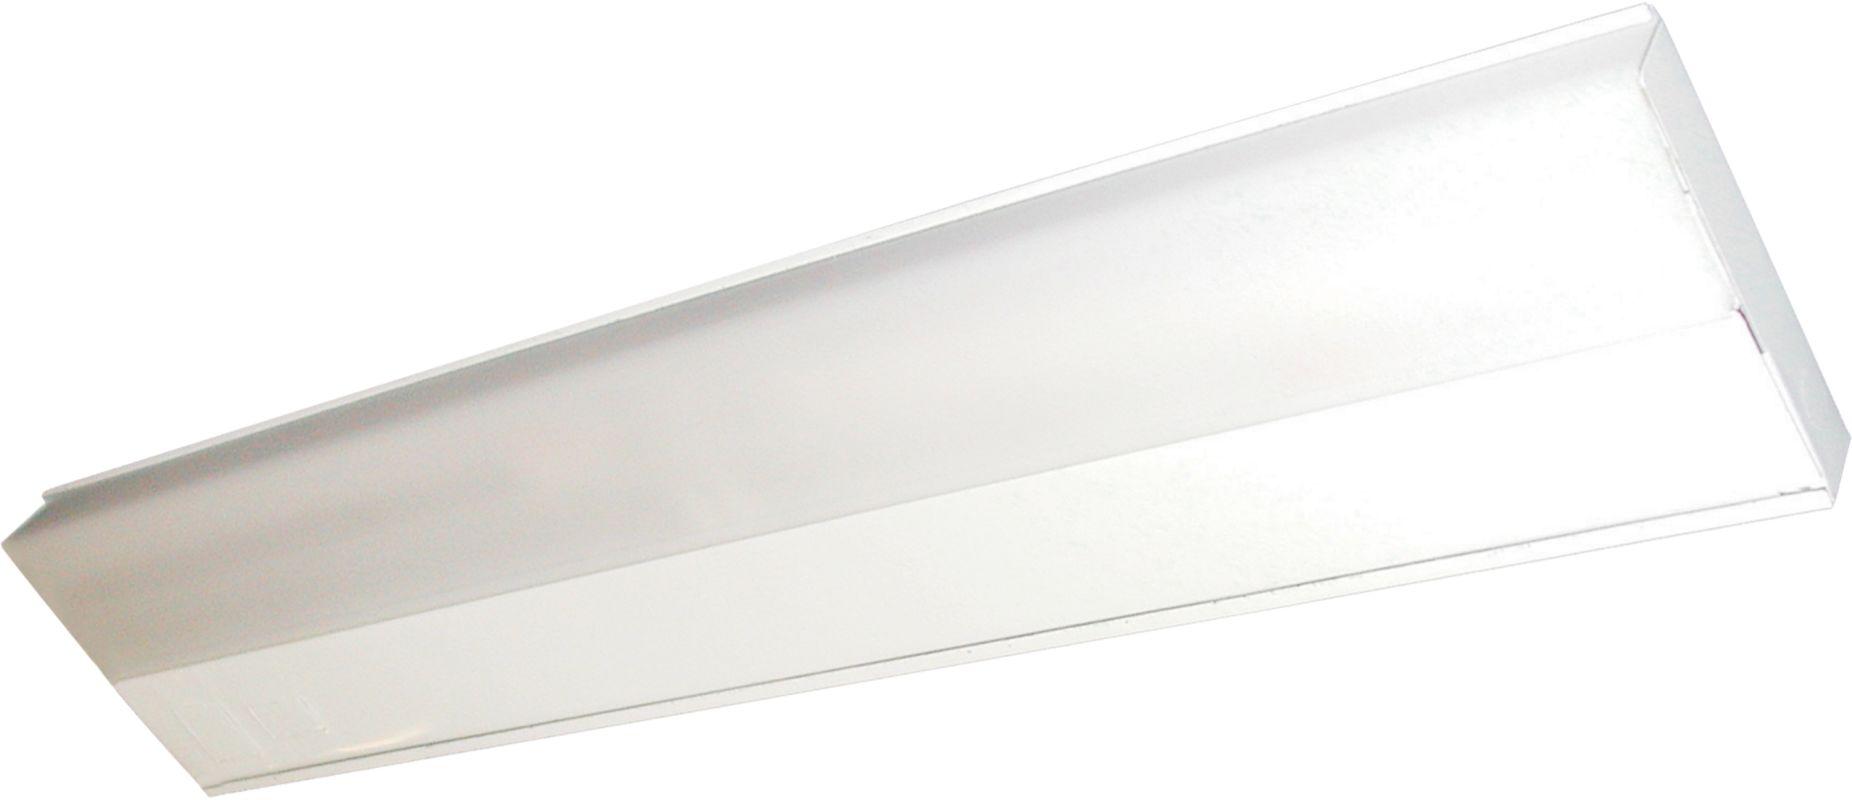 "Maxim 87806 1 Light 21"" Fluorescent Under Cabinet Light from the"